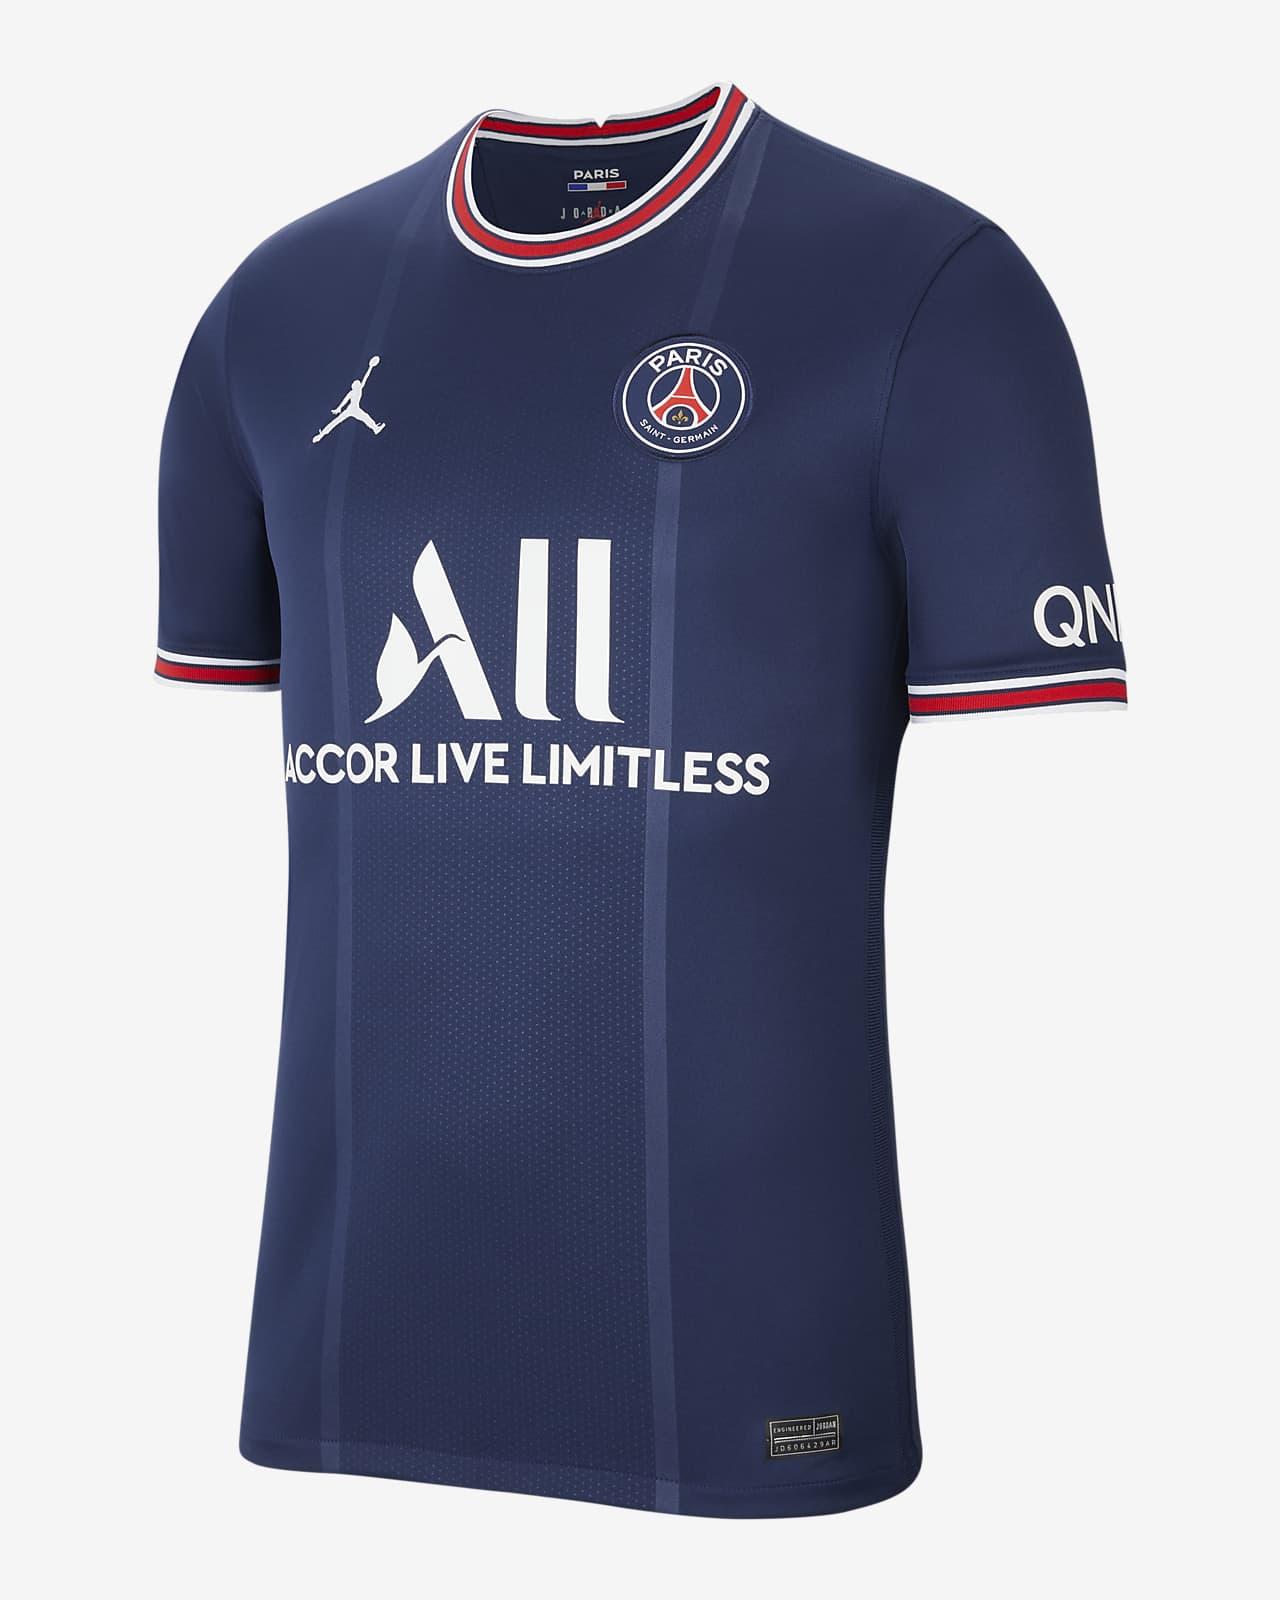 Paris Saint-Germain 2021/22 Stadium Home Men's Football Shirt